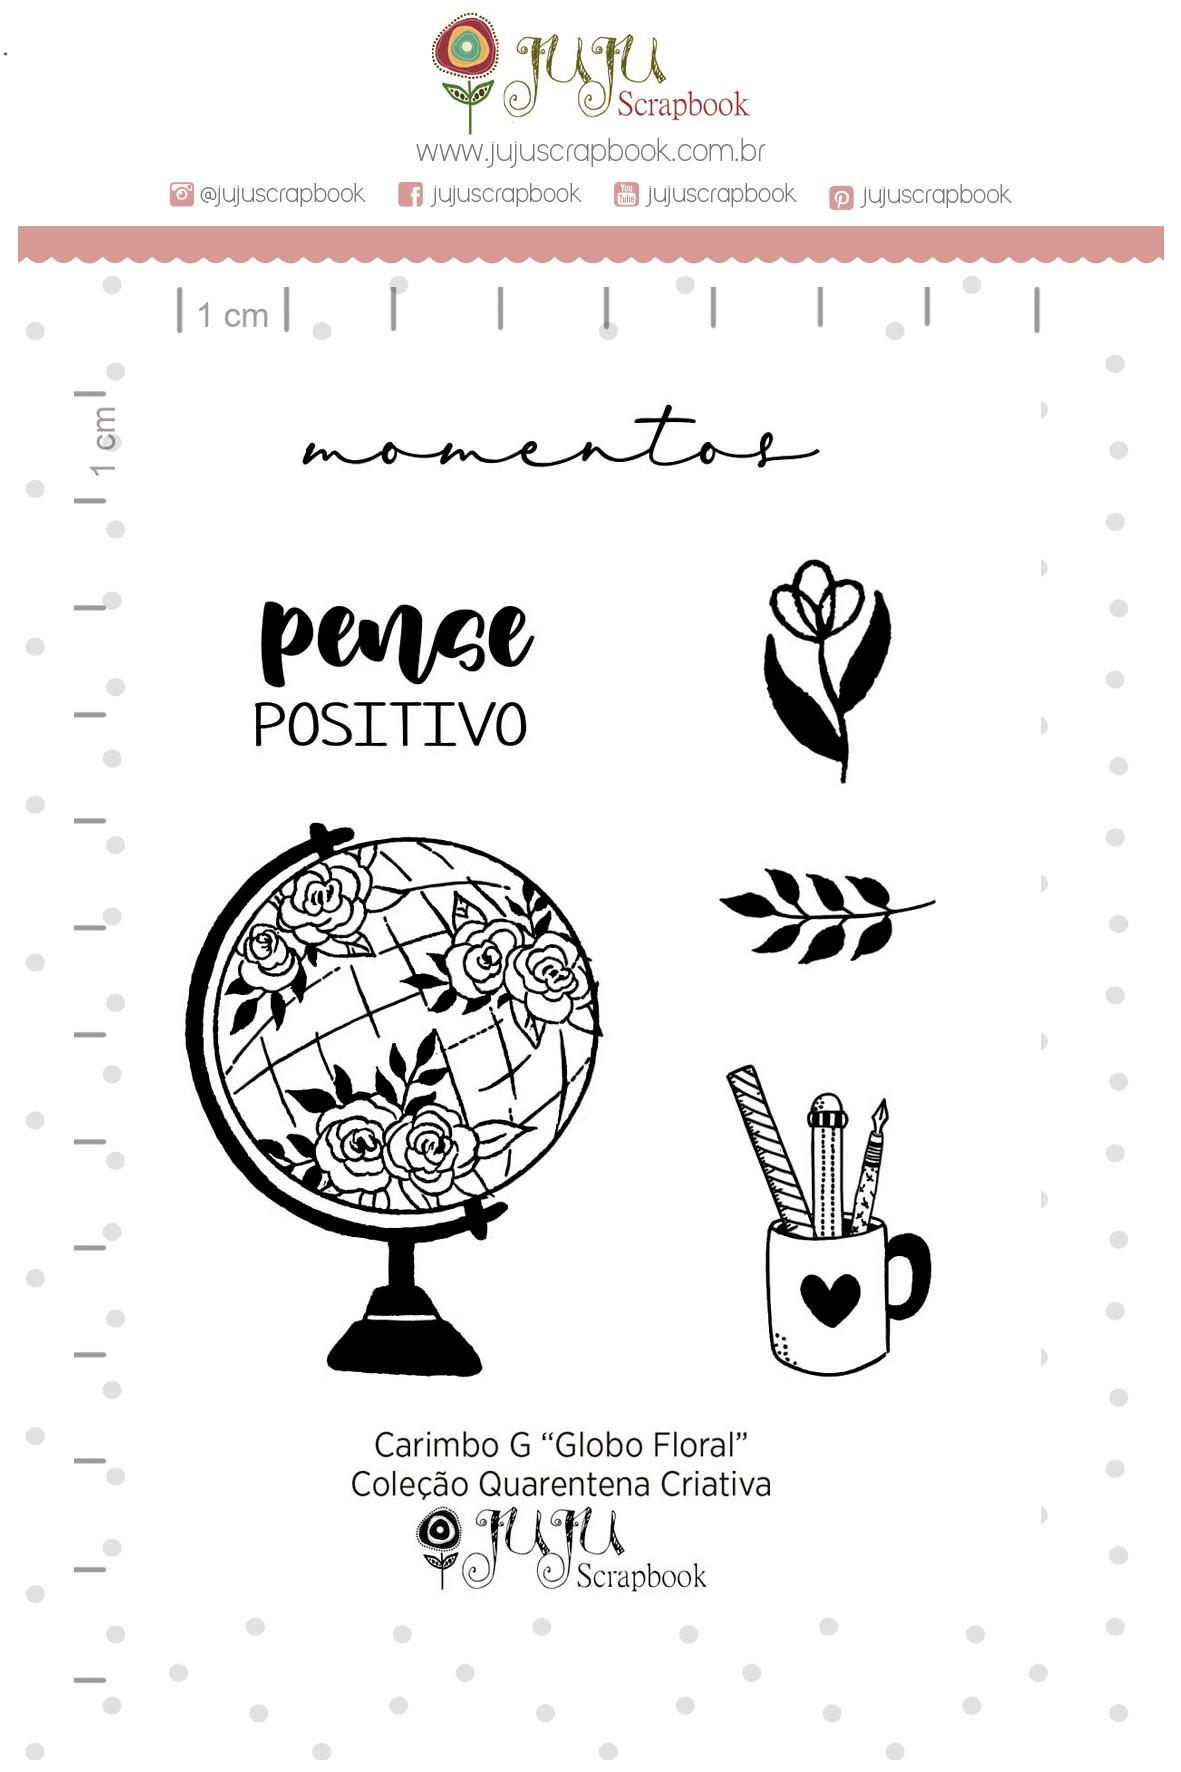 Kit de Carimbos  M - Globo Floral - Juju Scrapbook